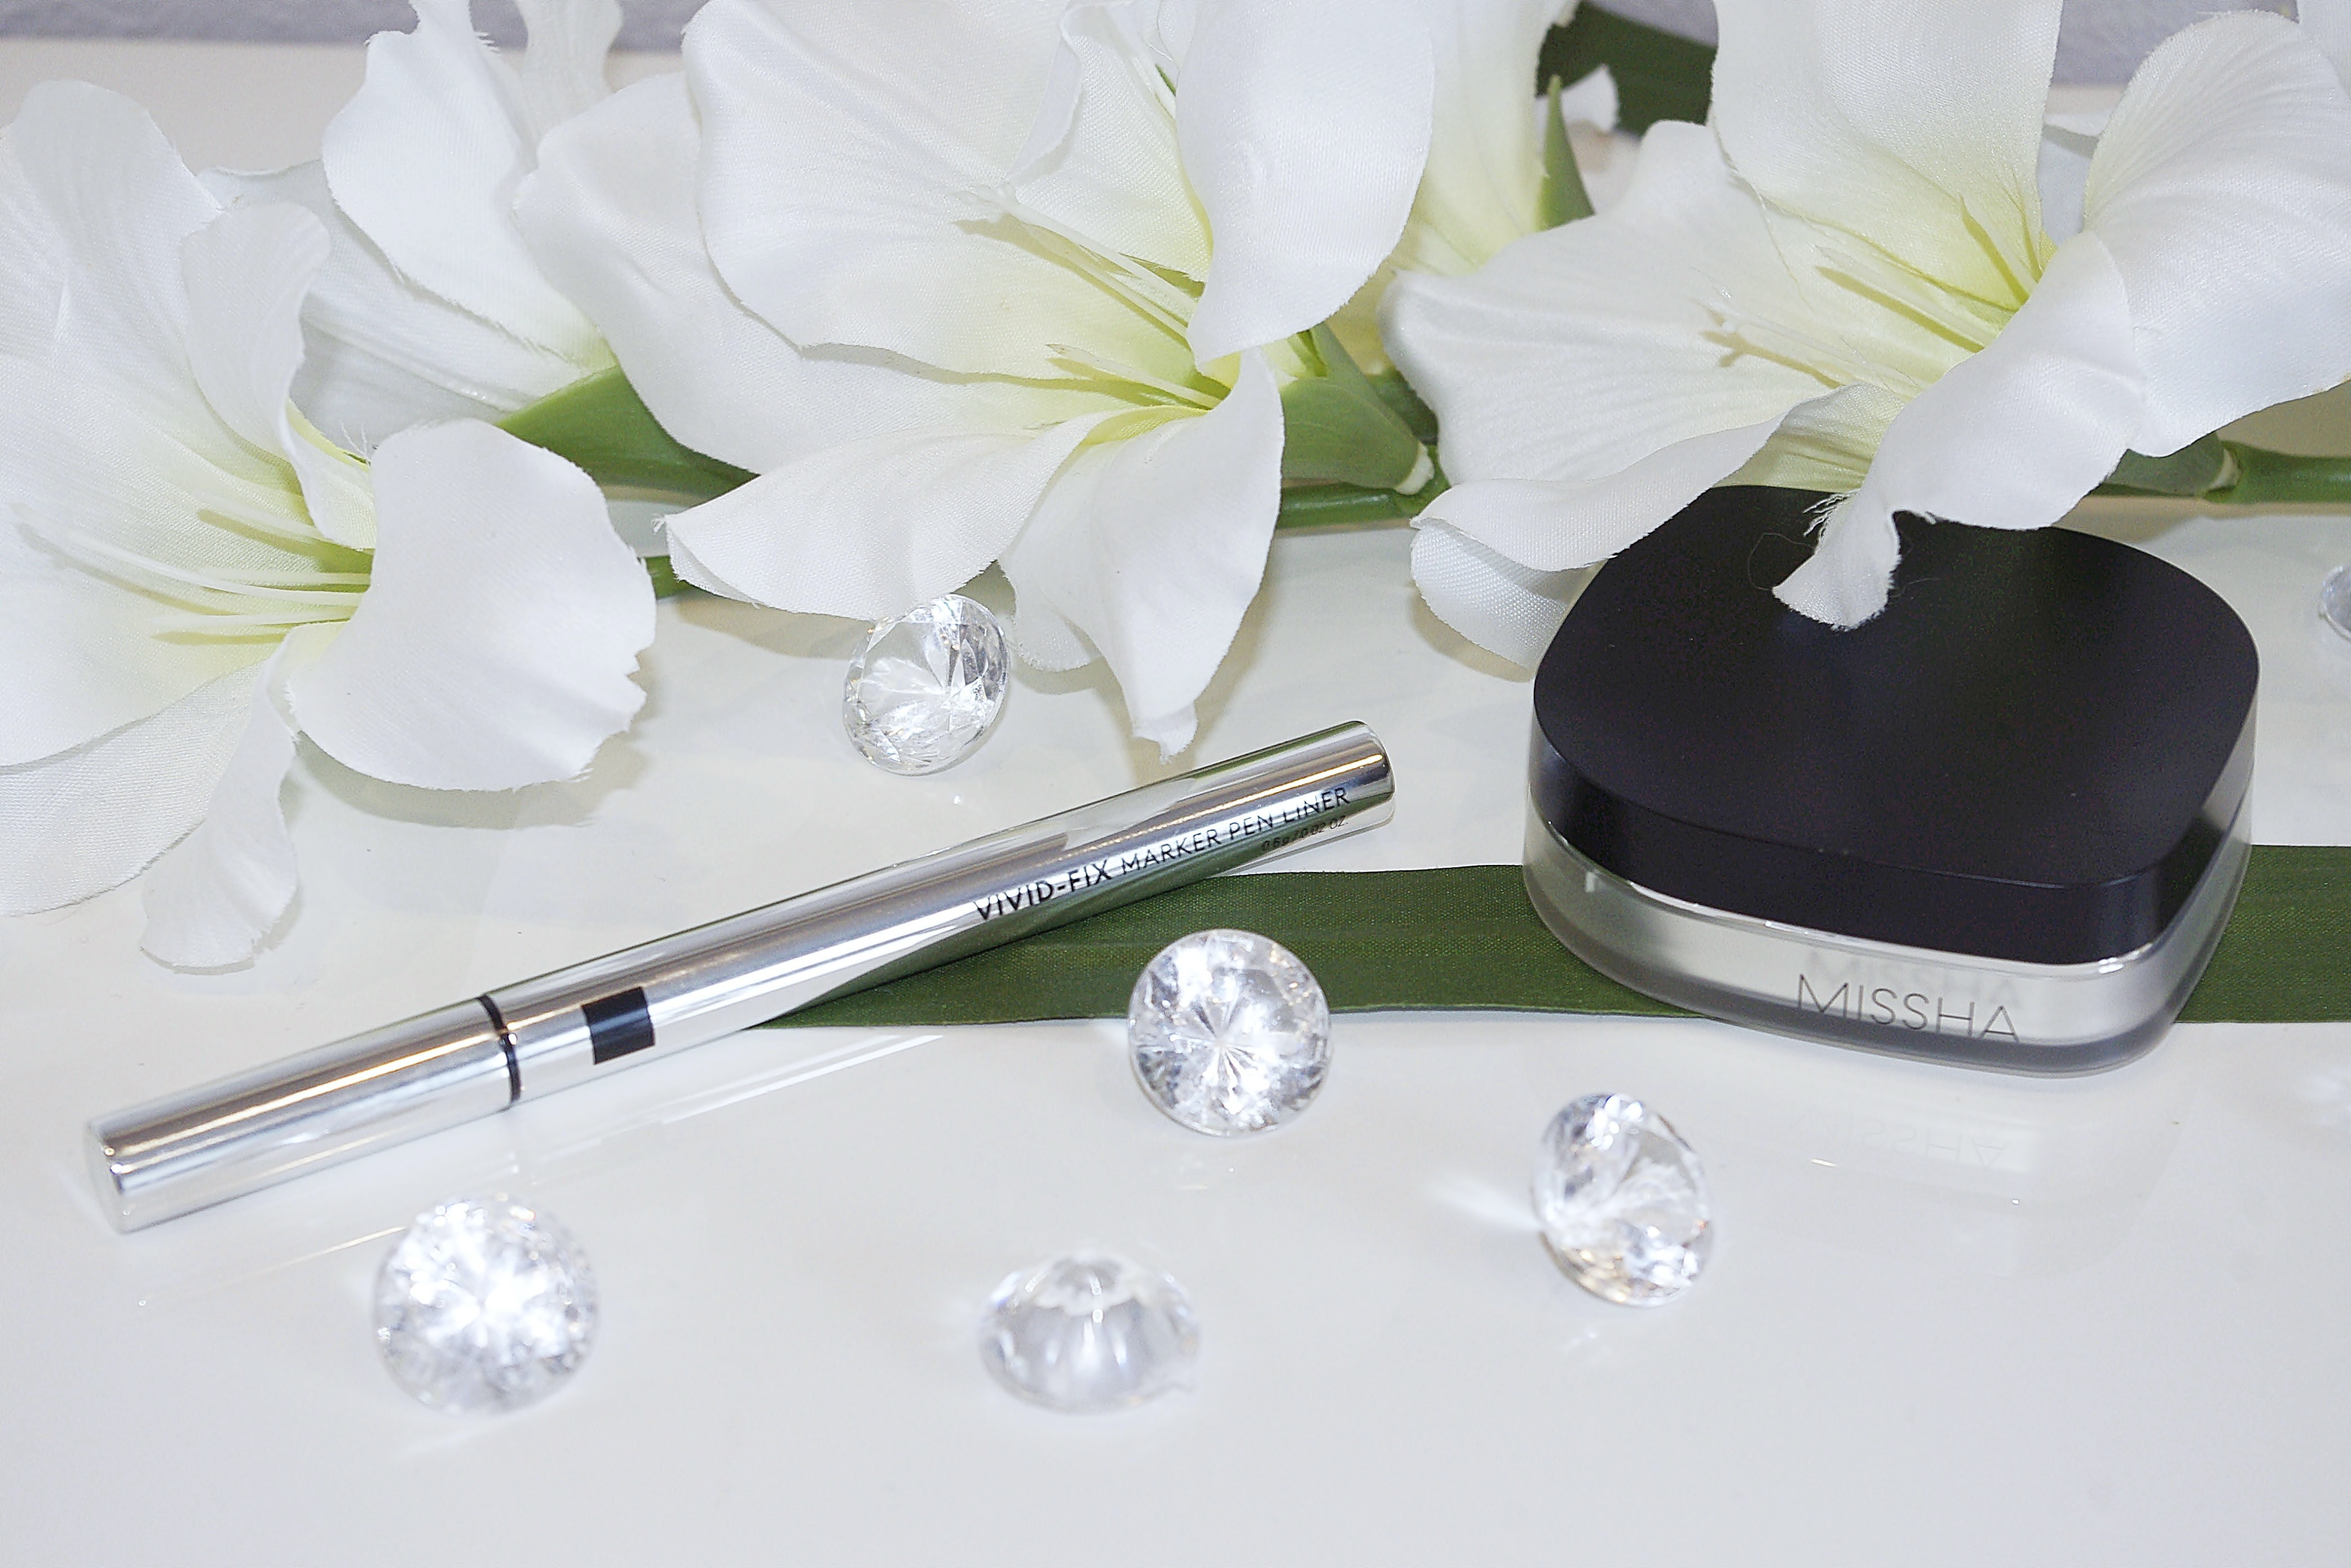 Missha - puder Signature Dramatic Two-Way Pact SPF25 PA++ i Vivid Fix Marker Pen Liner